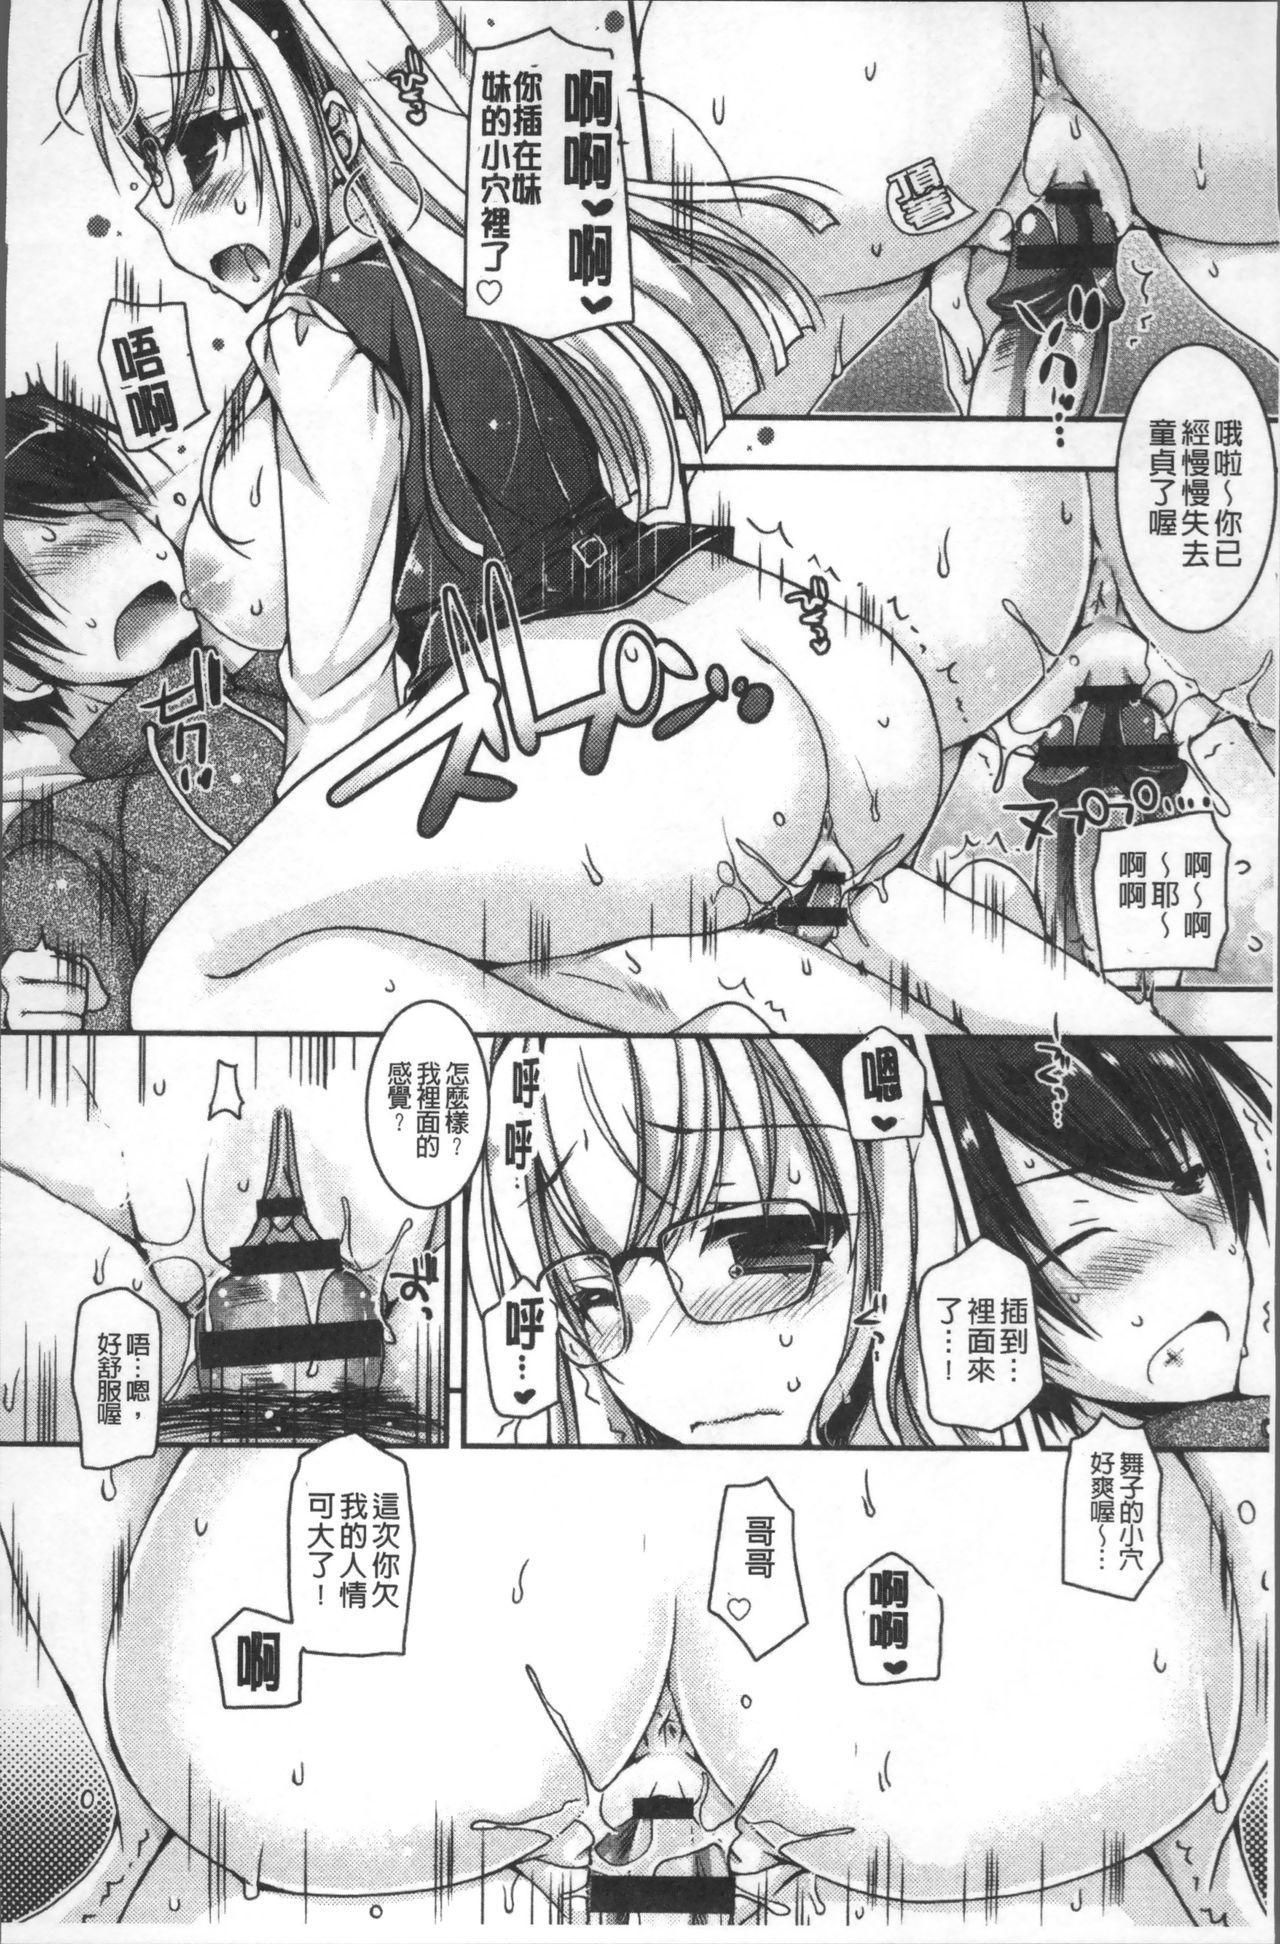 [Ueda Rieko] Doutei Killer na Imouto ~Bitch-kei Kyonyuu Gal ni Yarare Houdai~ | 童貞殺手的妹妹~被淫女系巨乳小辣妹給玩弄個過癮~ [Chinese] 173